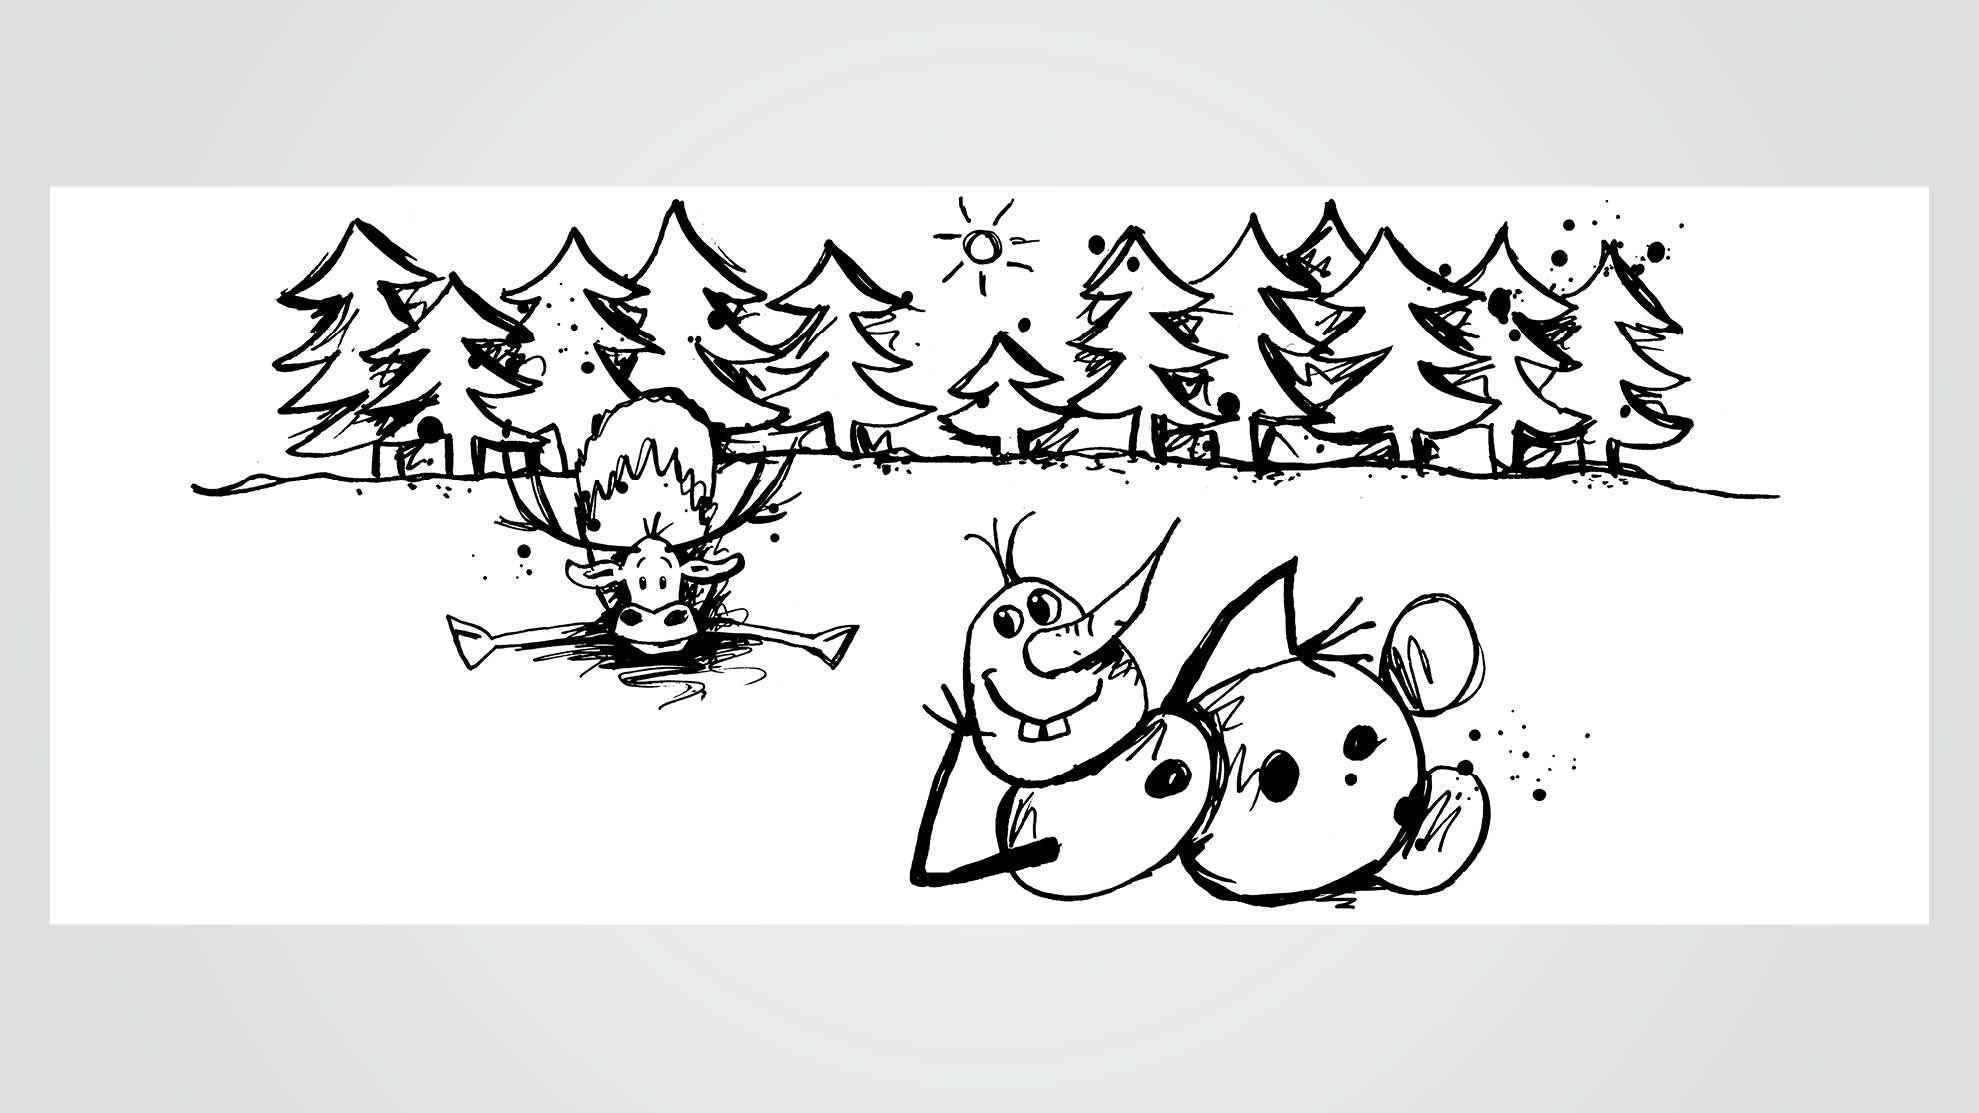 kinobecher-illustration-stadtwerke-essen-07.jpg